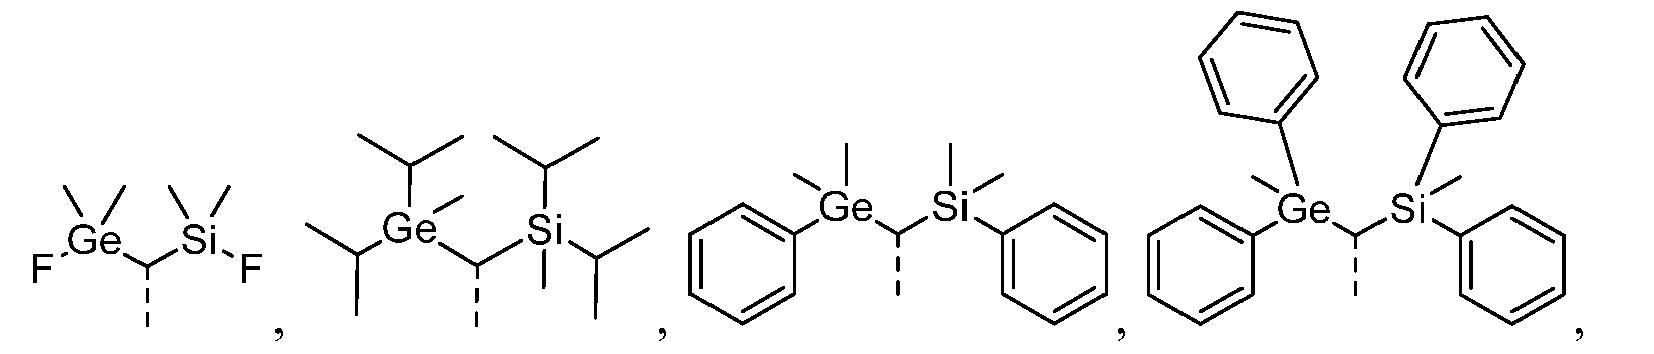 Figure imgb0395